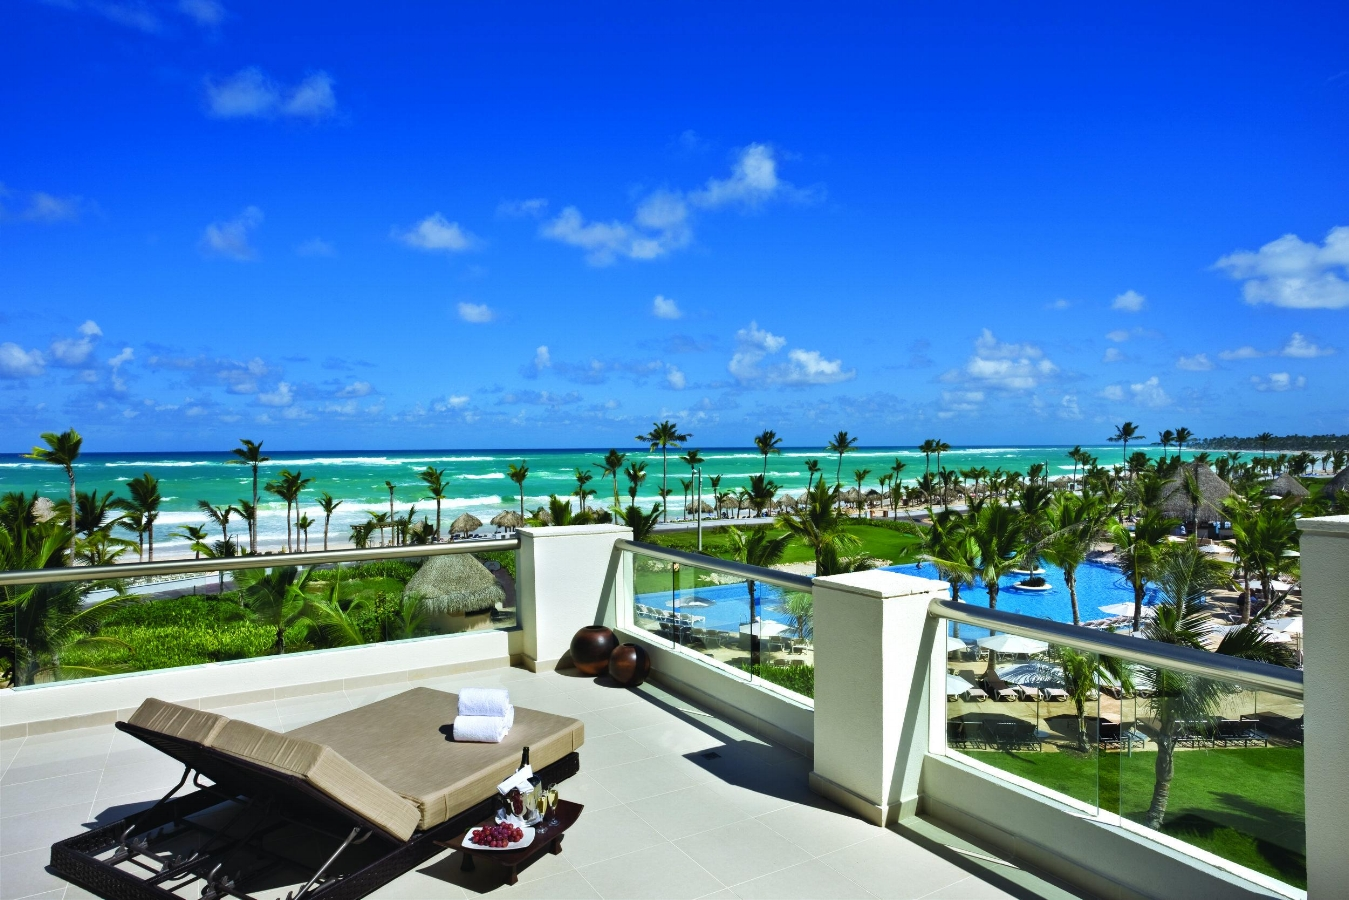 HRH-Punta-Cana-Balcony-View-of-Beach.jpg